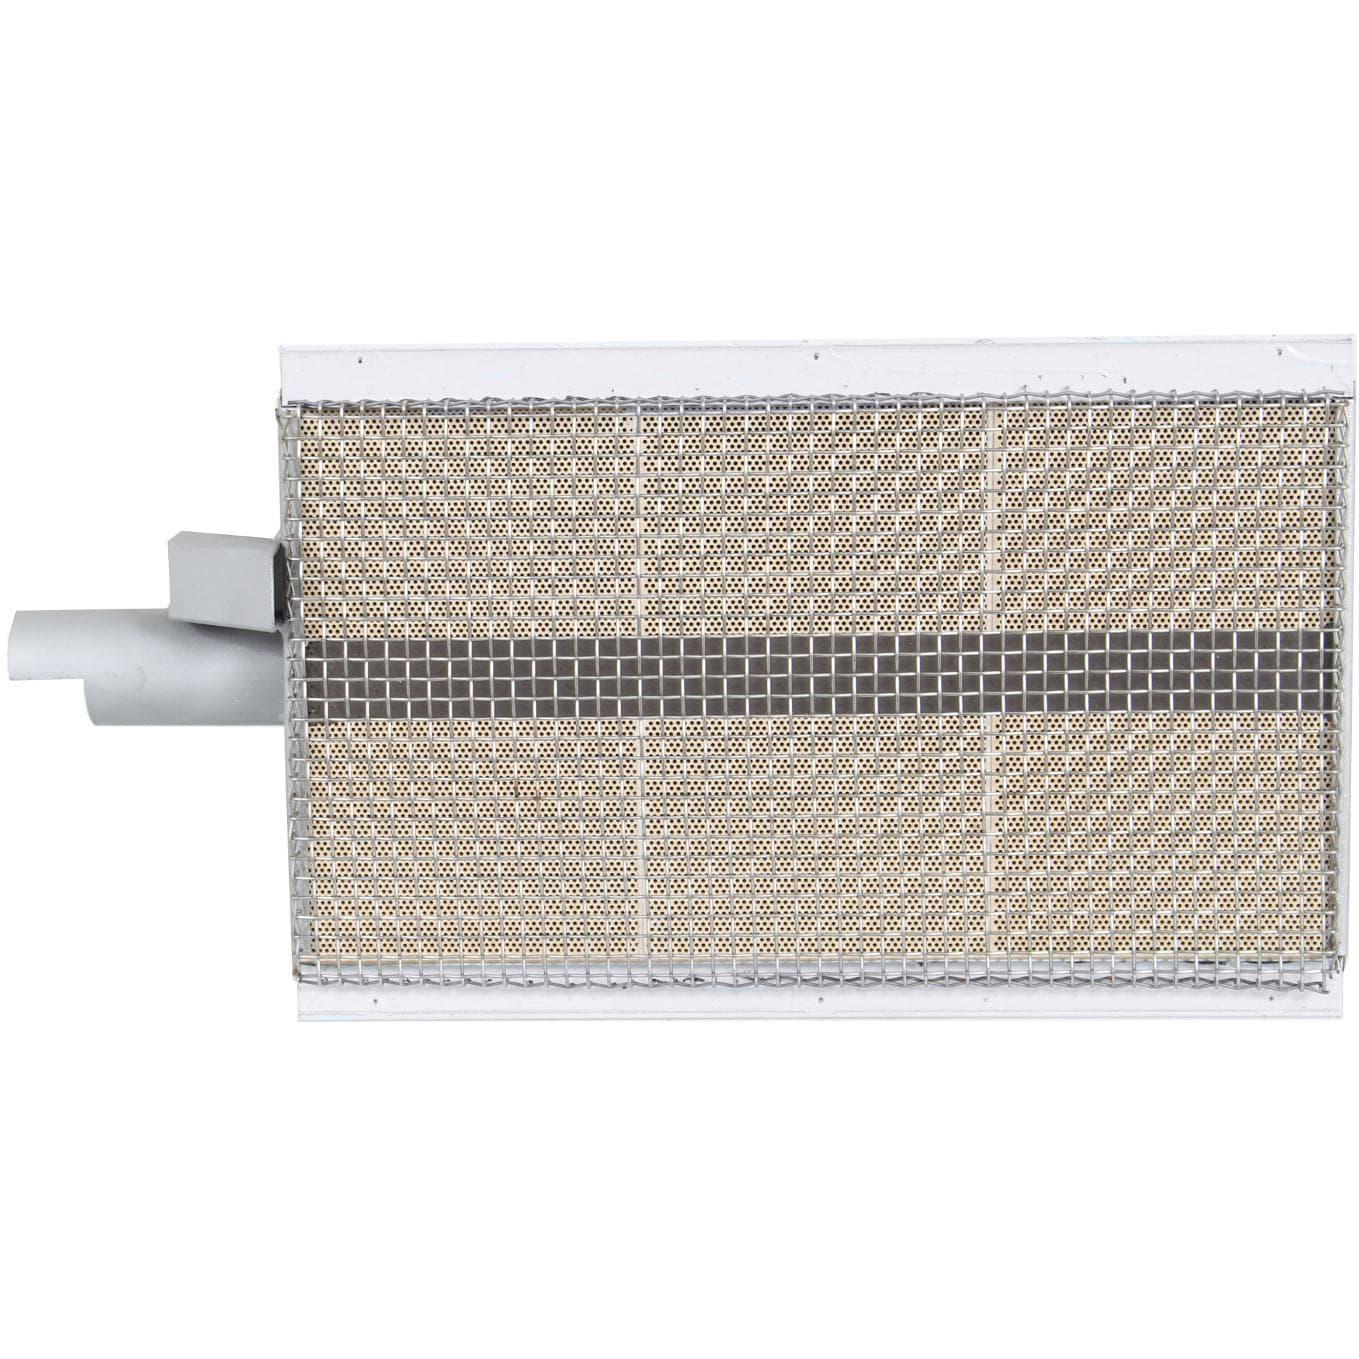 Blaze Professional LUX Infrared Searing burner - BLZ-PRO-IR